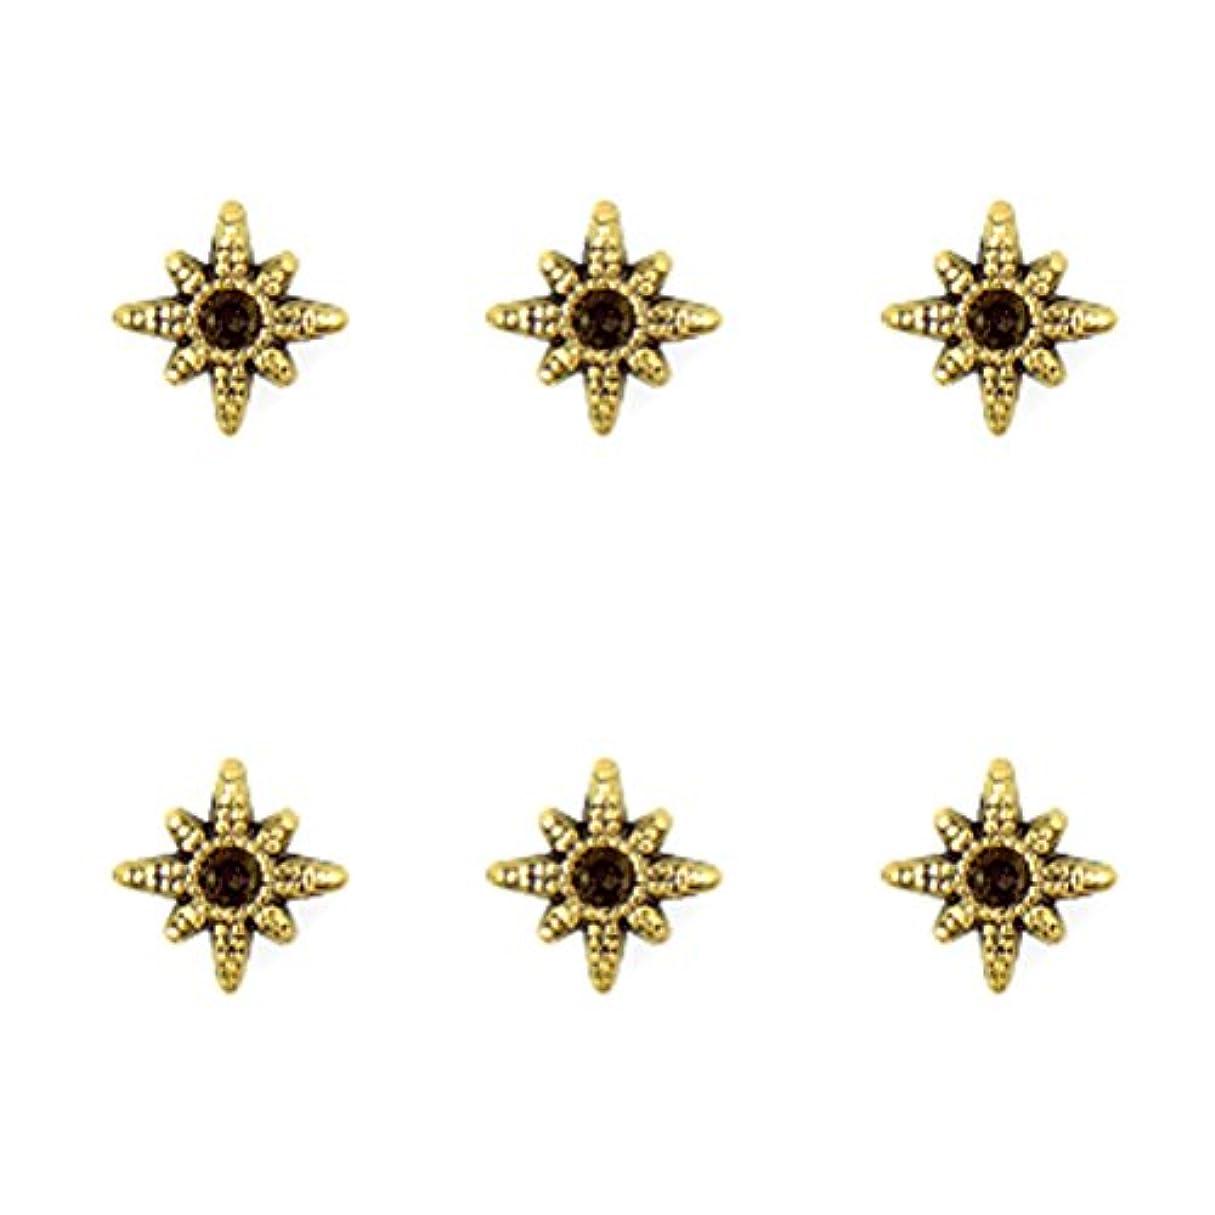 Bonnail ユアセルフゴールドフレーム ブリンク